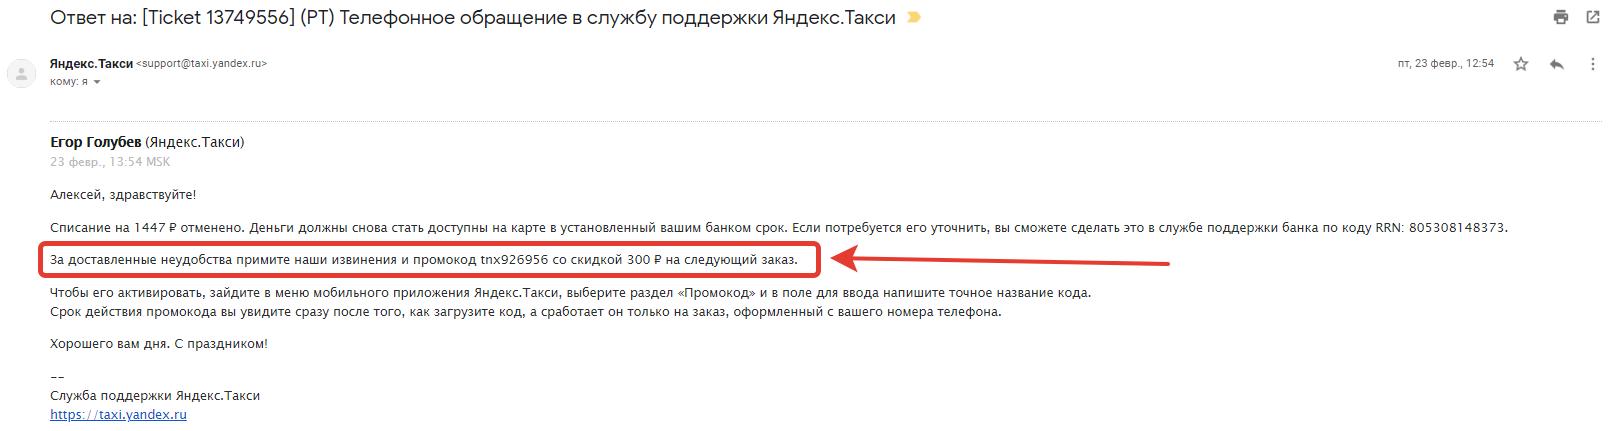 Промокод на поездку Яндекс.Такси